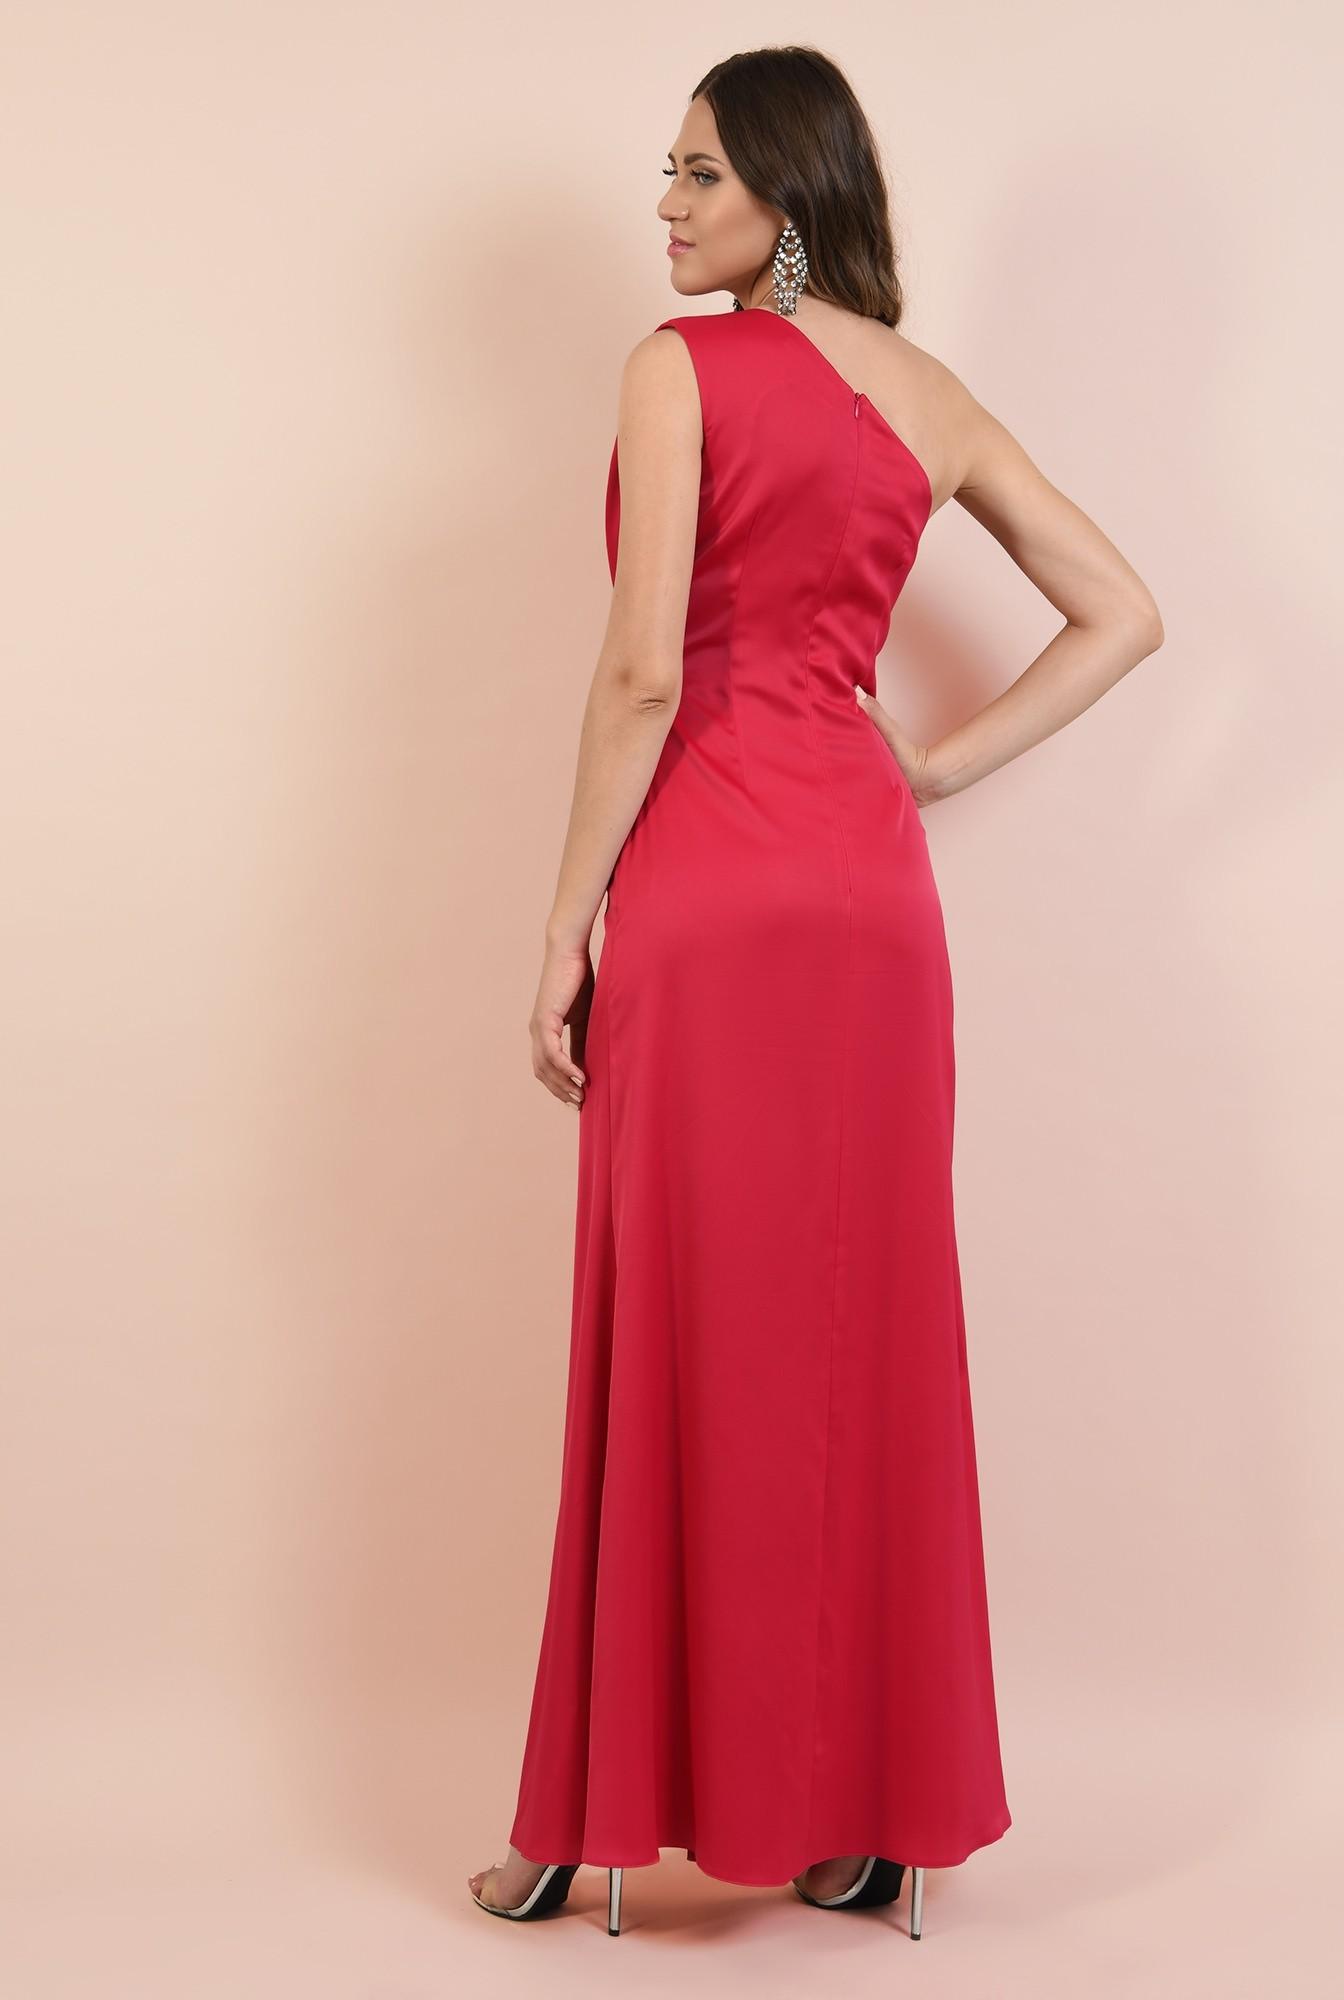 1 - rochie eleganta, lunga, cu slit adanc, cusatura in talie